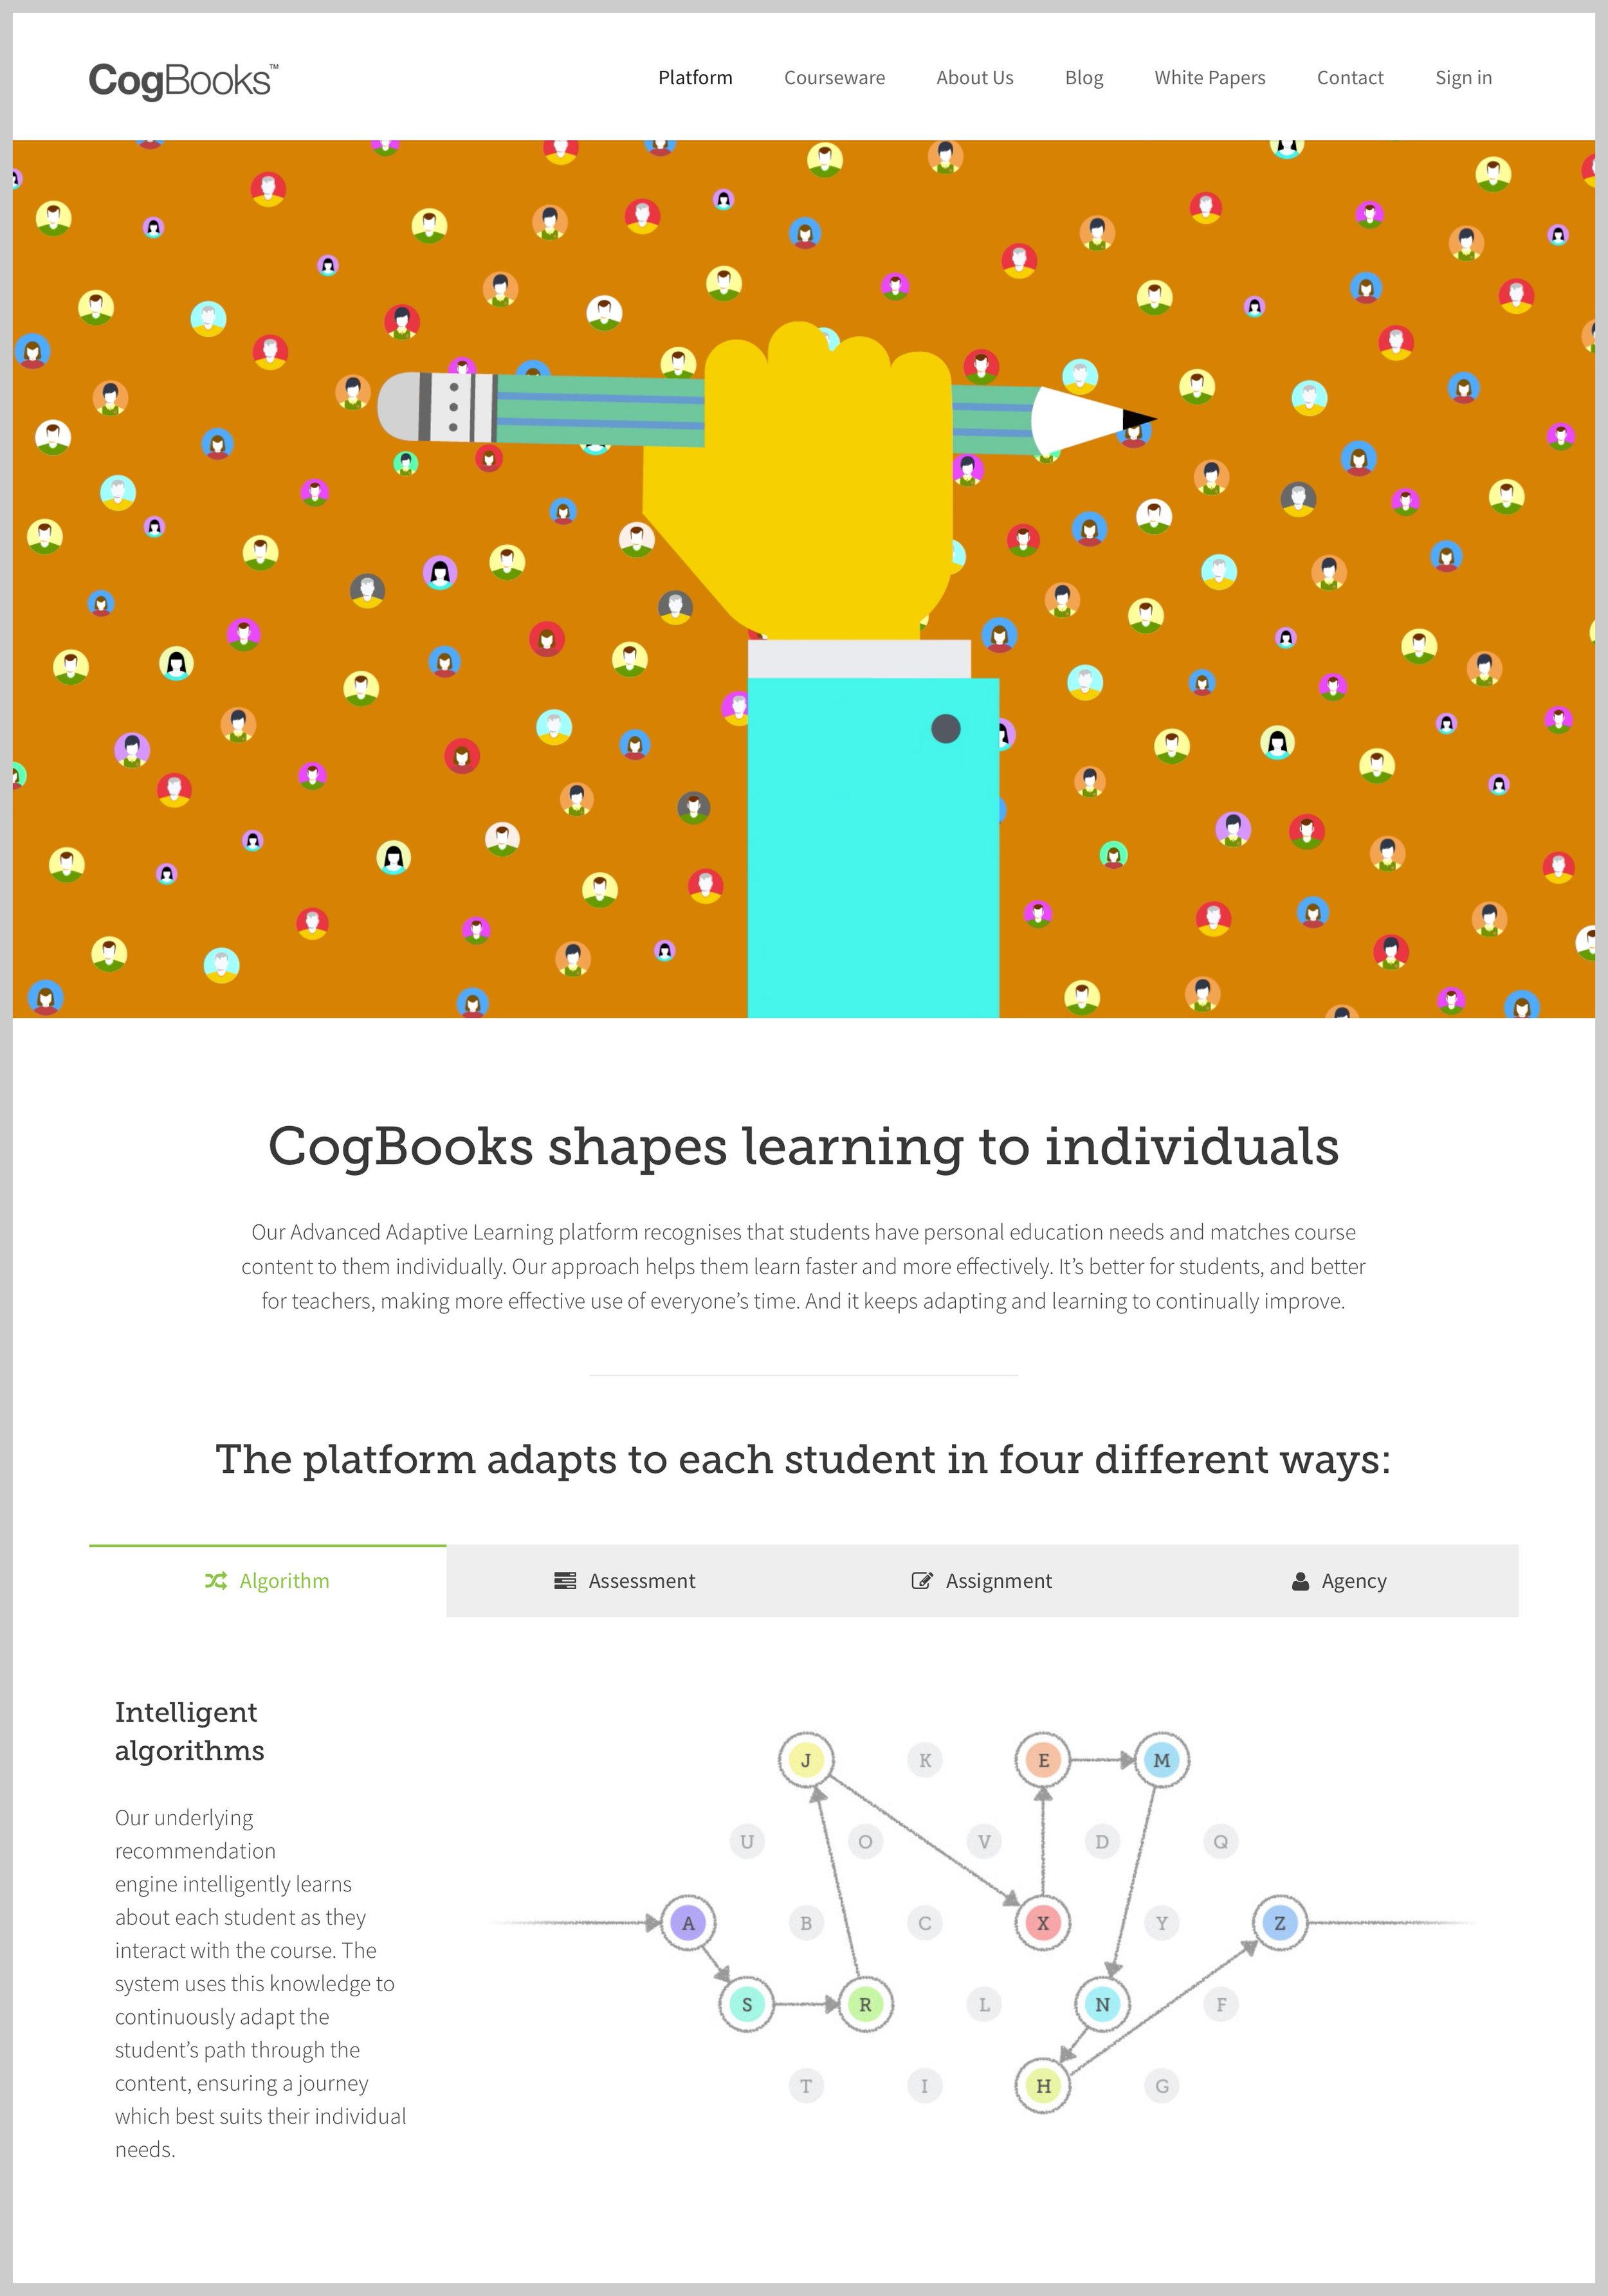 CogBooks-courseware-crop.jpg